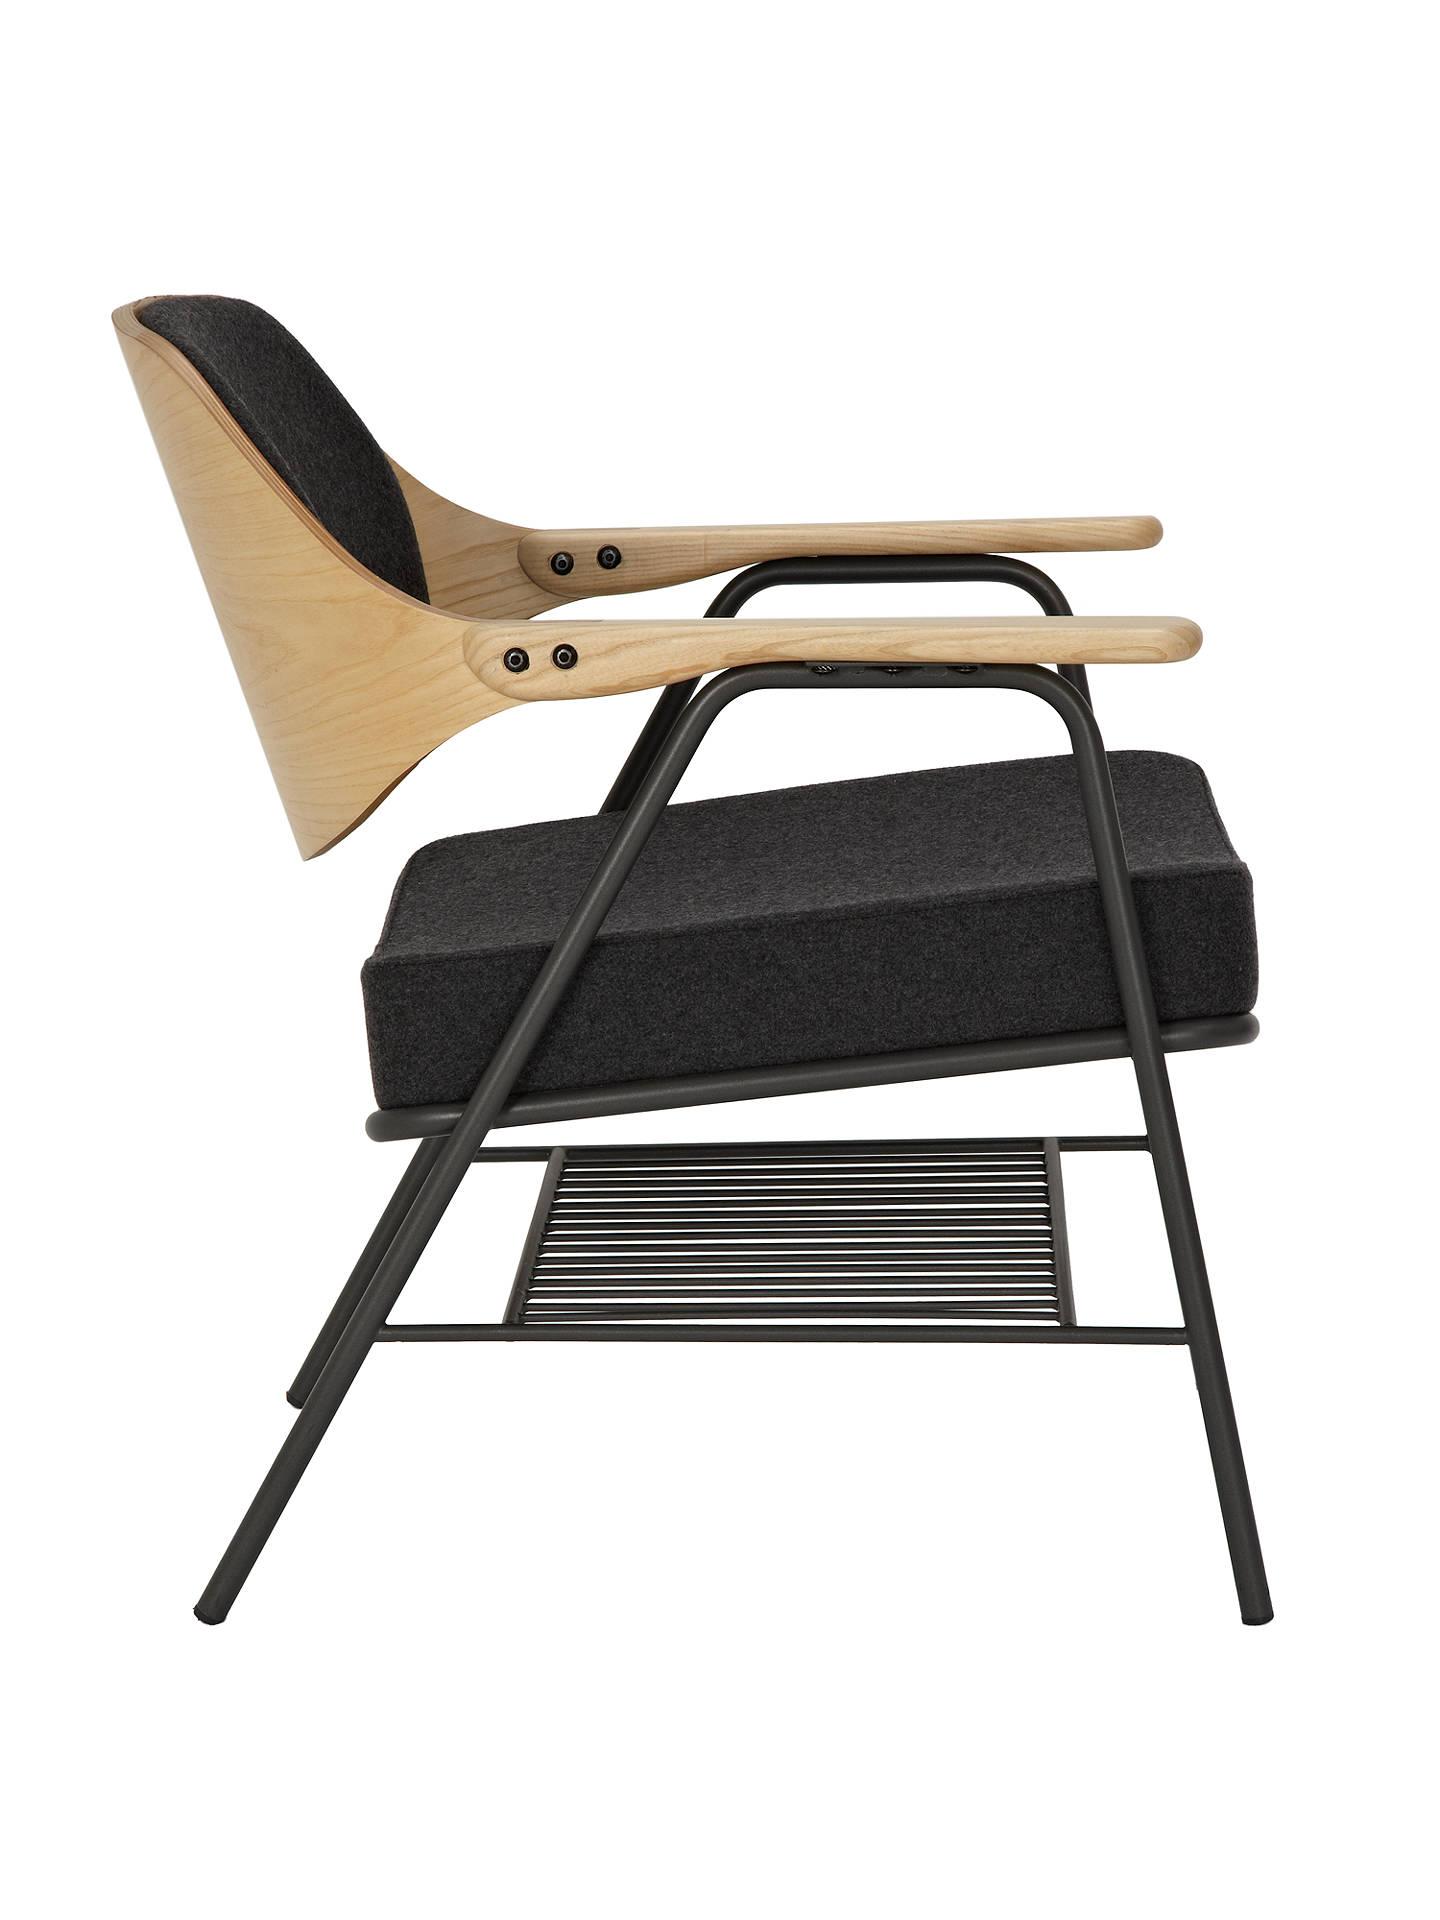 Miraculous Oliver Hrubiak For John Lewis Finn Lounge Chair At John Dailytribune Chair Design For Home Dailytribuneorg